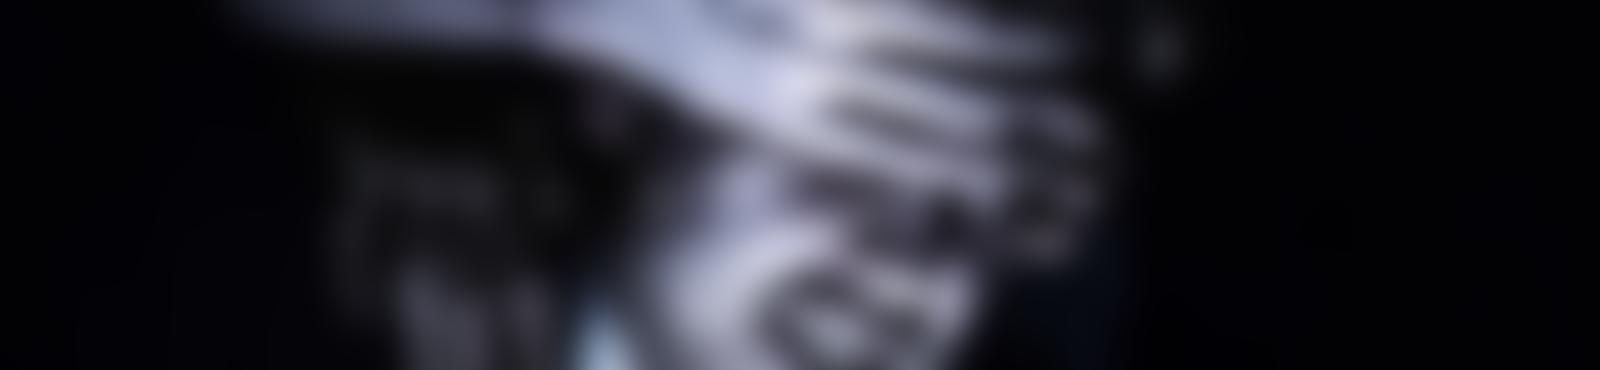 Blurred c1a9fa76 7de1 46d7 92dd ab6081ccfd4f